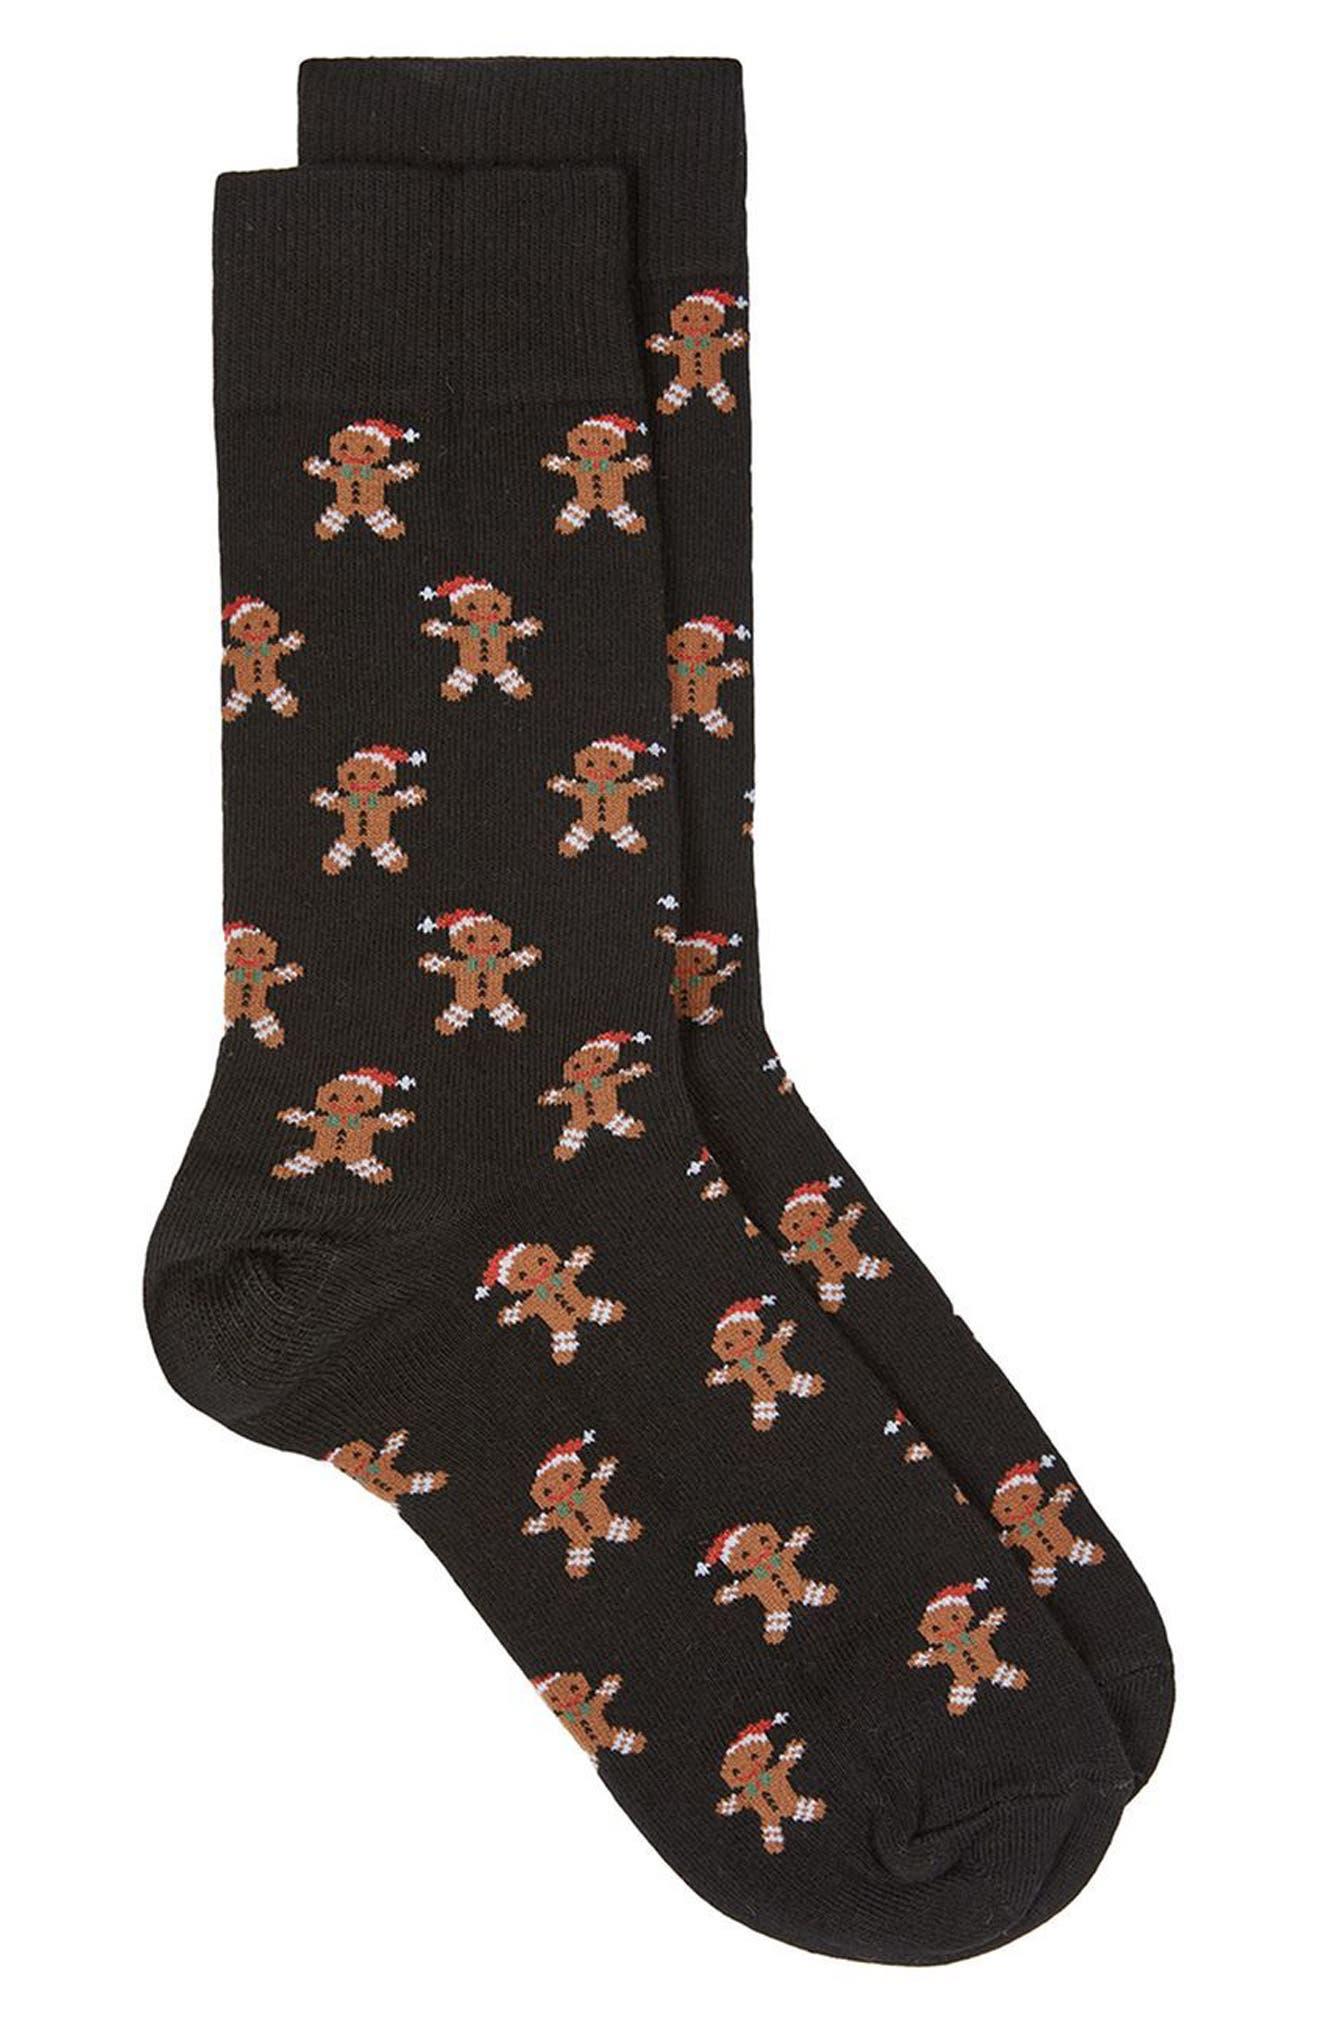 Topman Christmas Gingerbread Socks